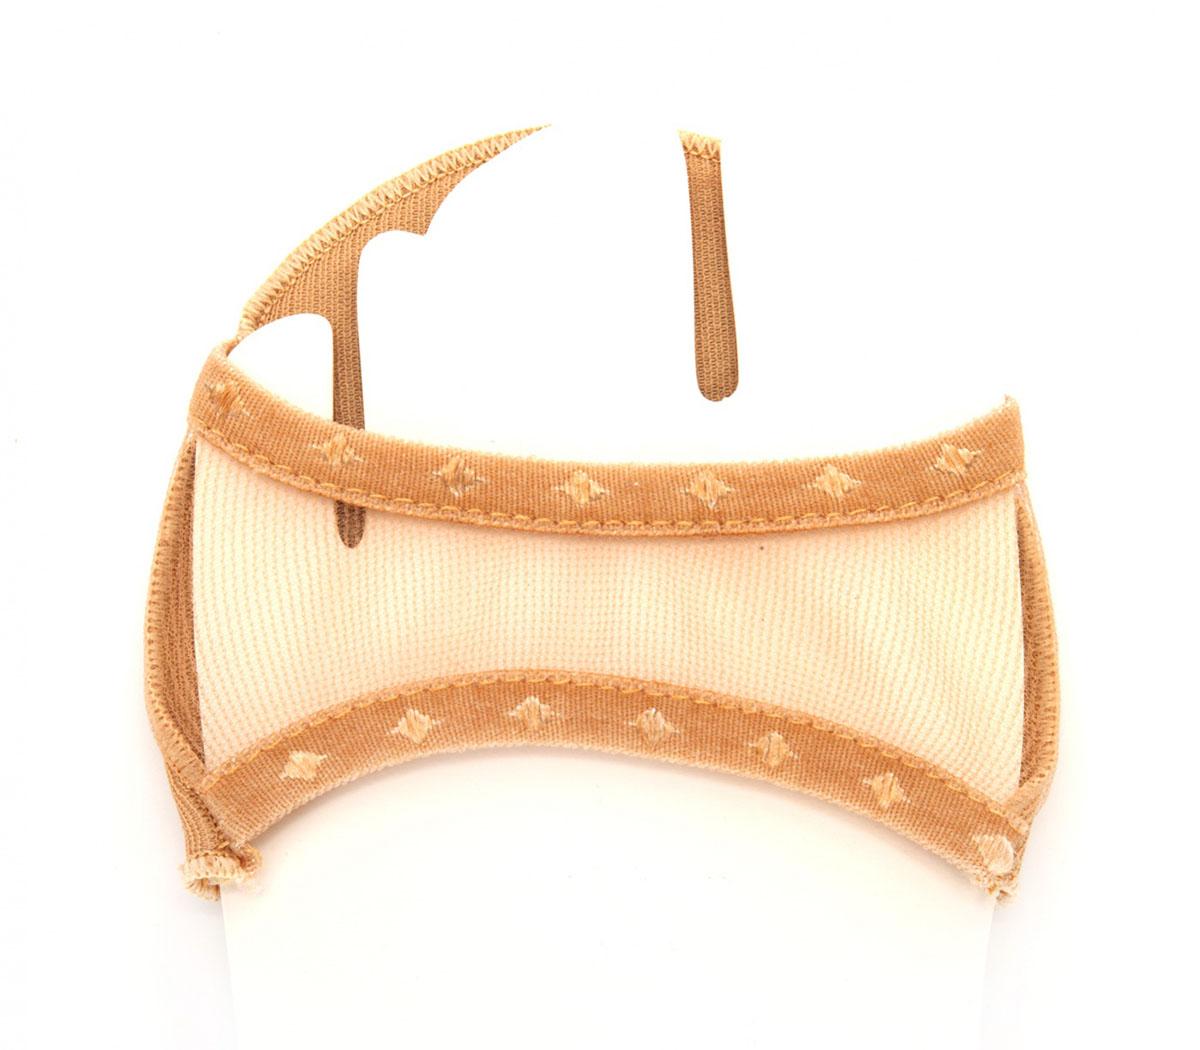 BRADEX Носочки мини с антискользящими подушечками САМУИ (Bradex)